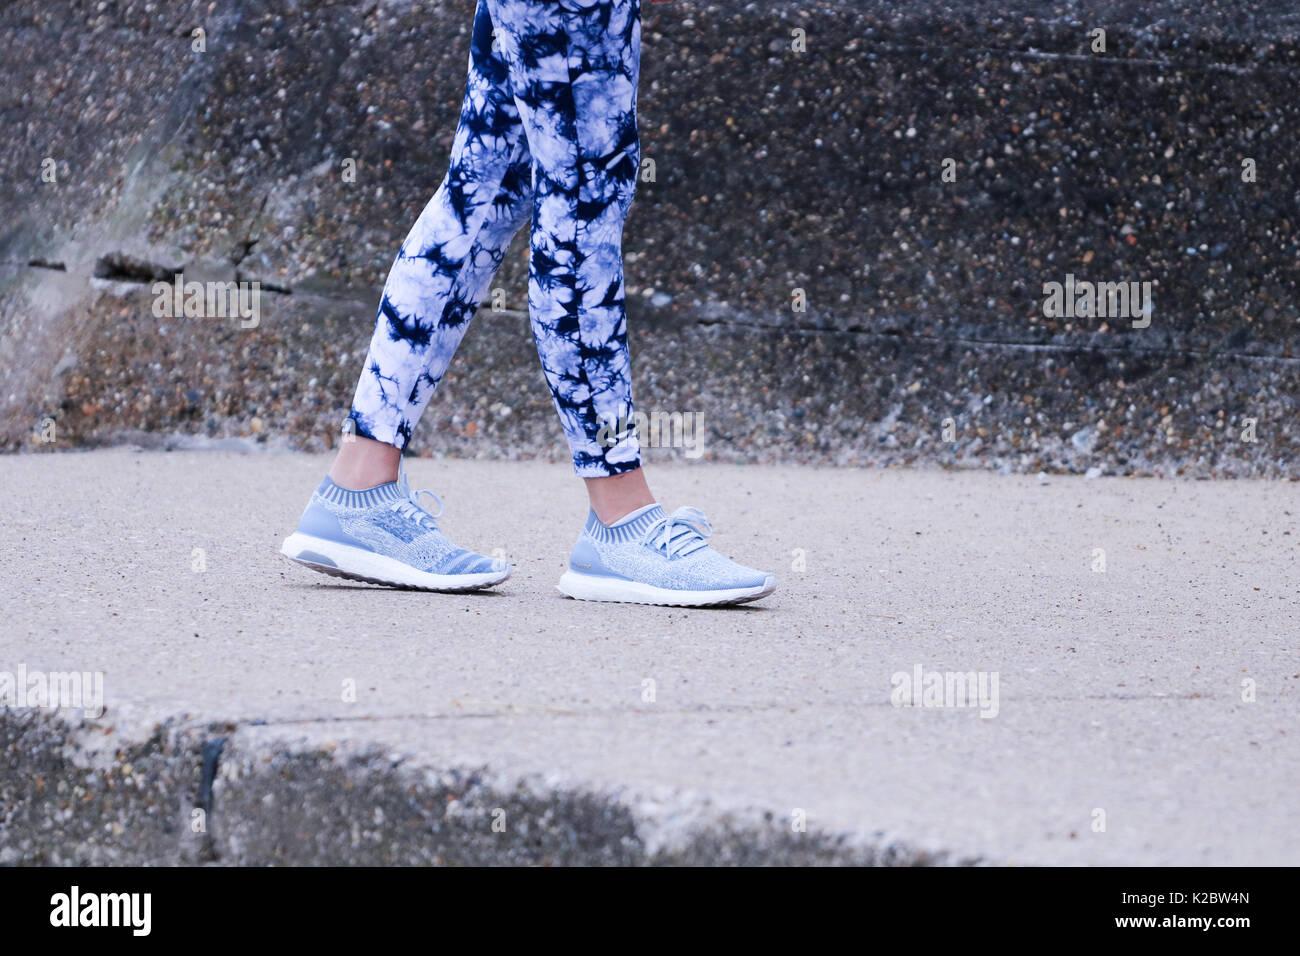 adidas ultra boost walking